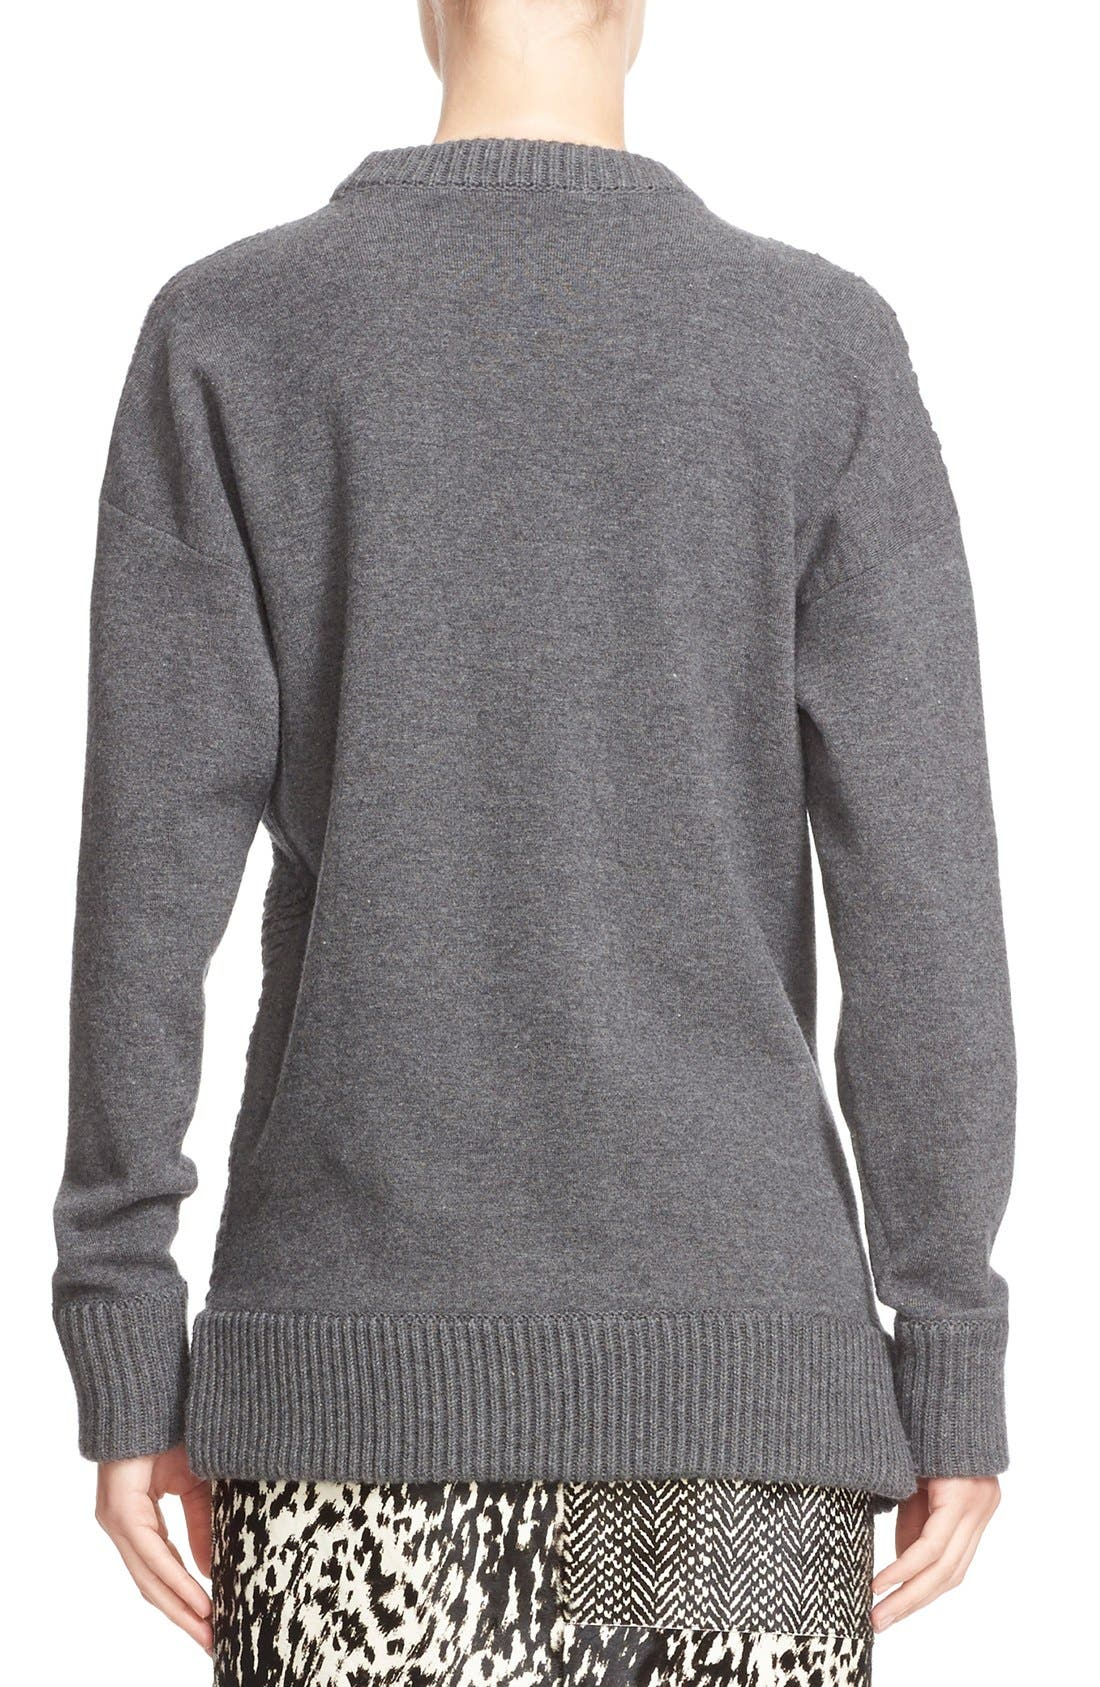 Alternate Image 2  - Jason Wu Cashmere & Wool Blend Textured Sweater